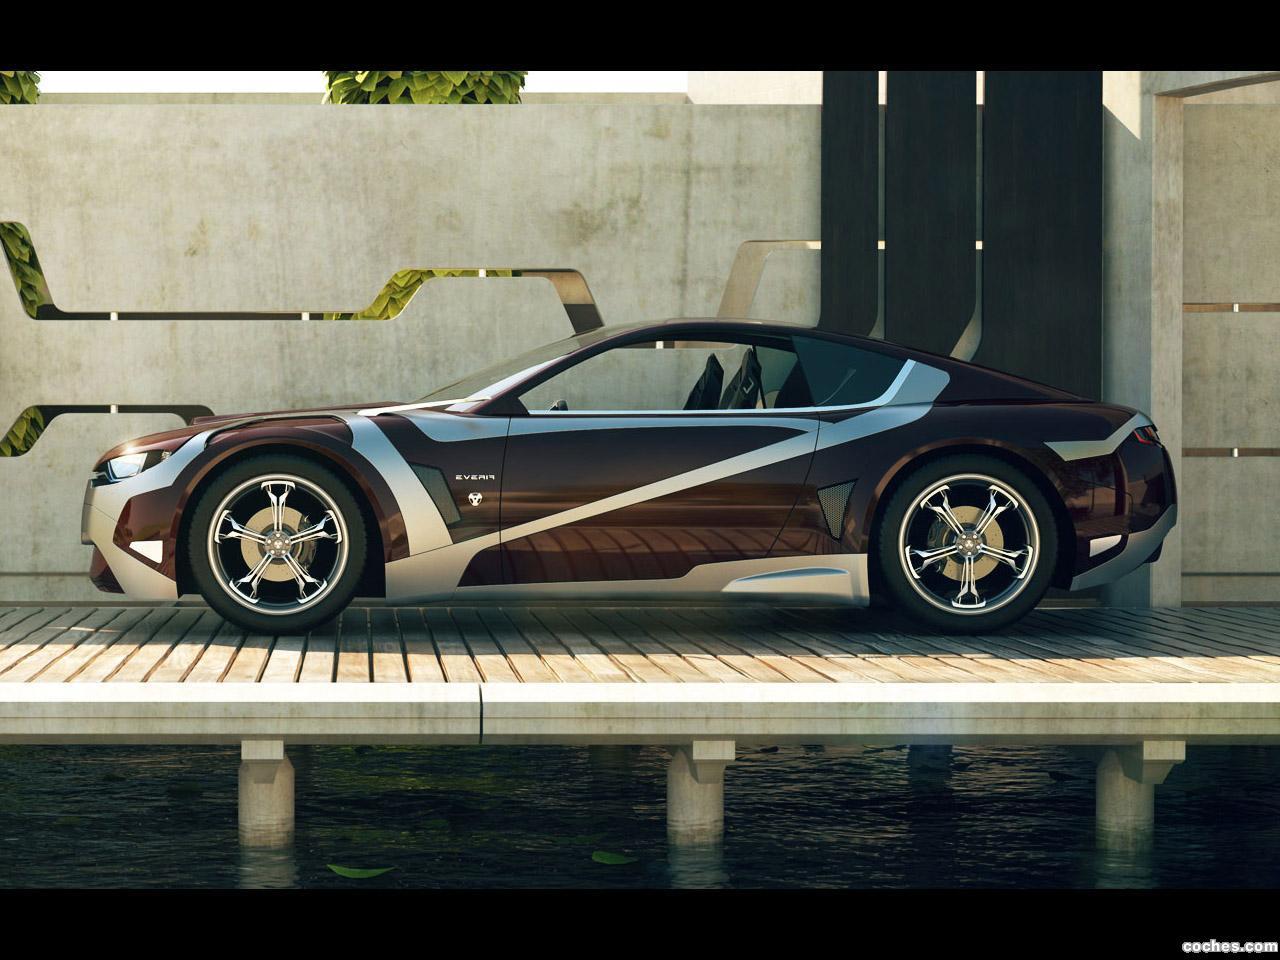 Foto 3 de Tronatic Everia Concept 2012